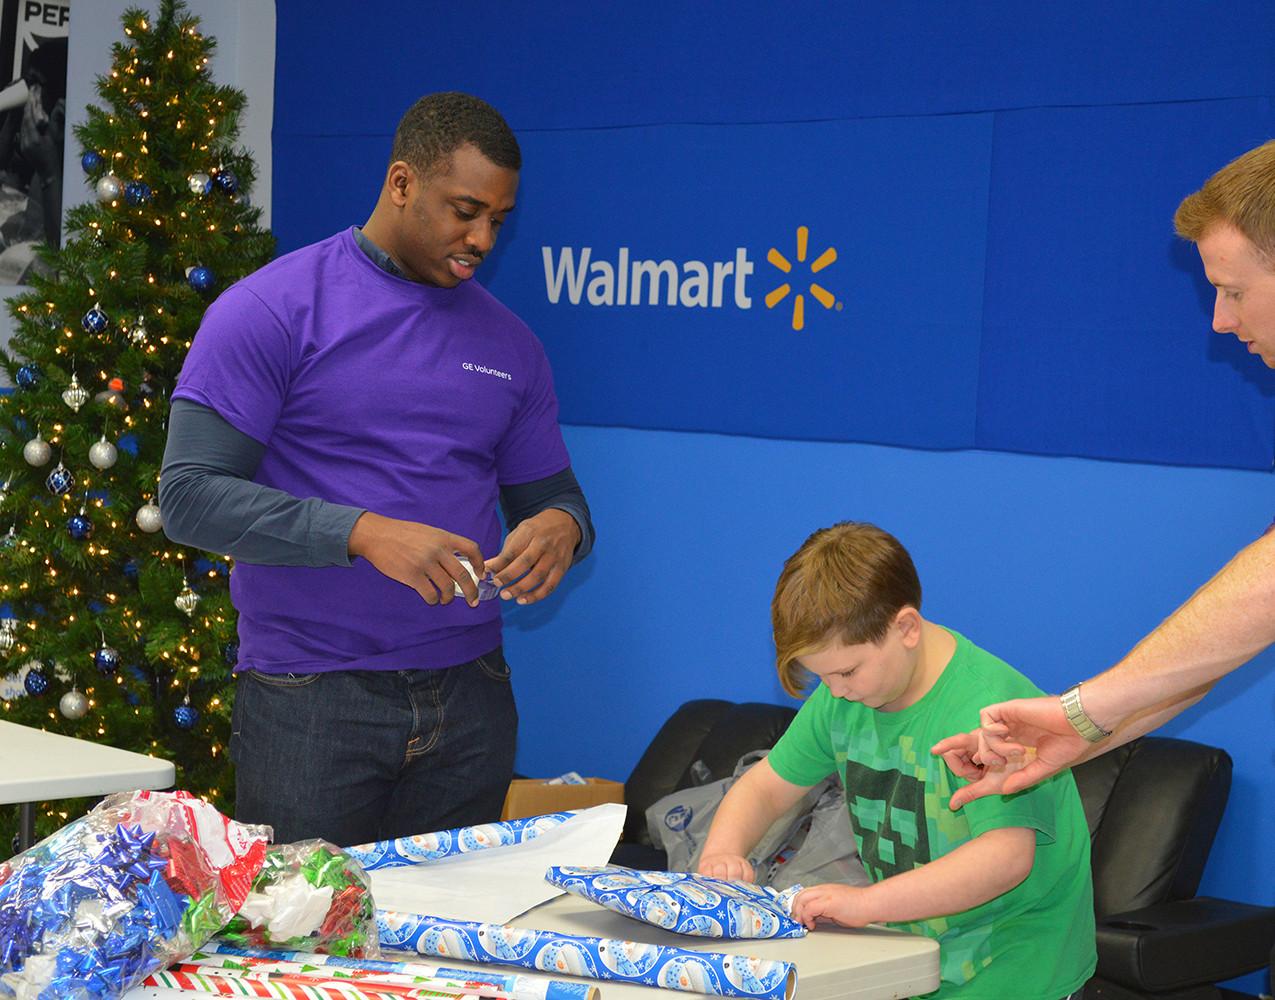 GE Holiday Shopping 12.8.17